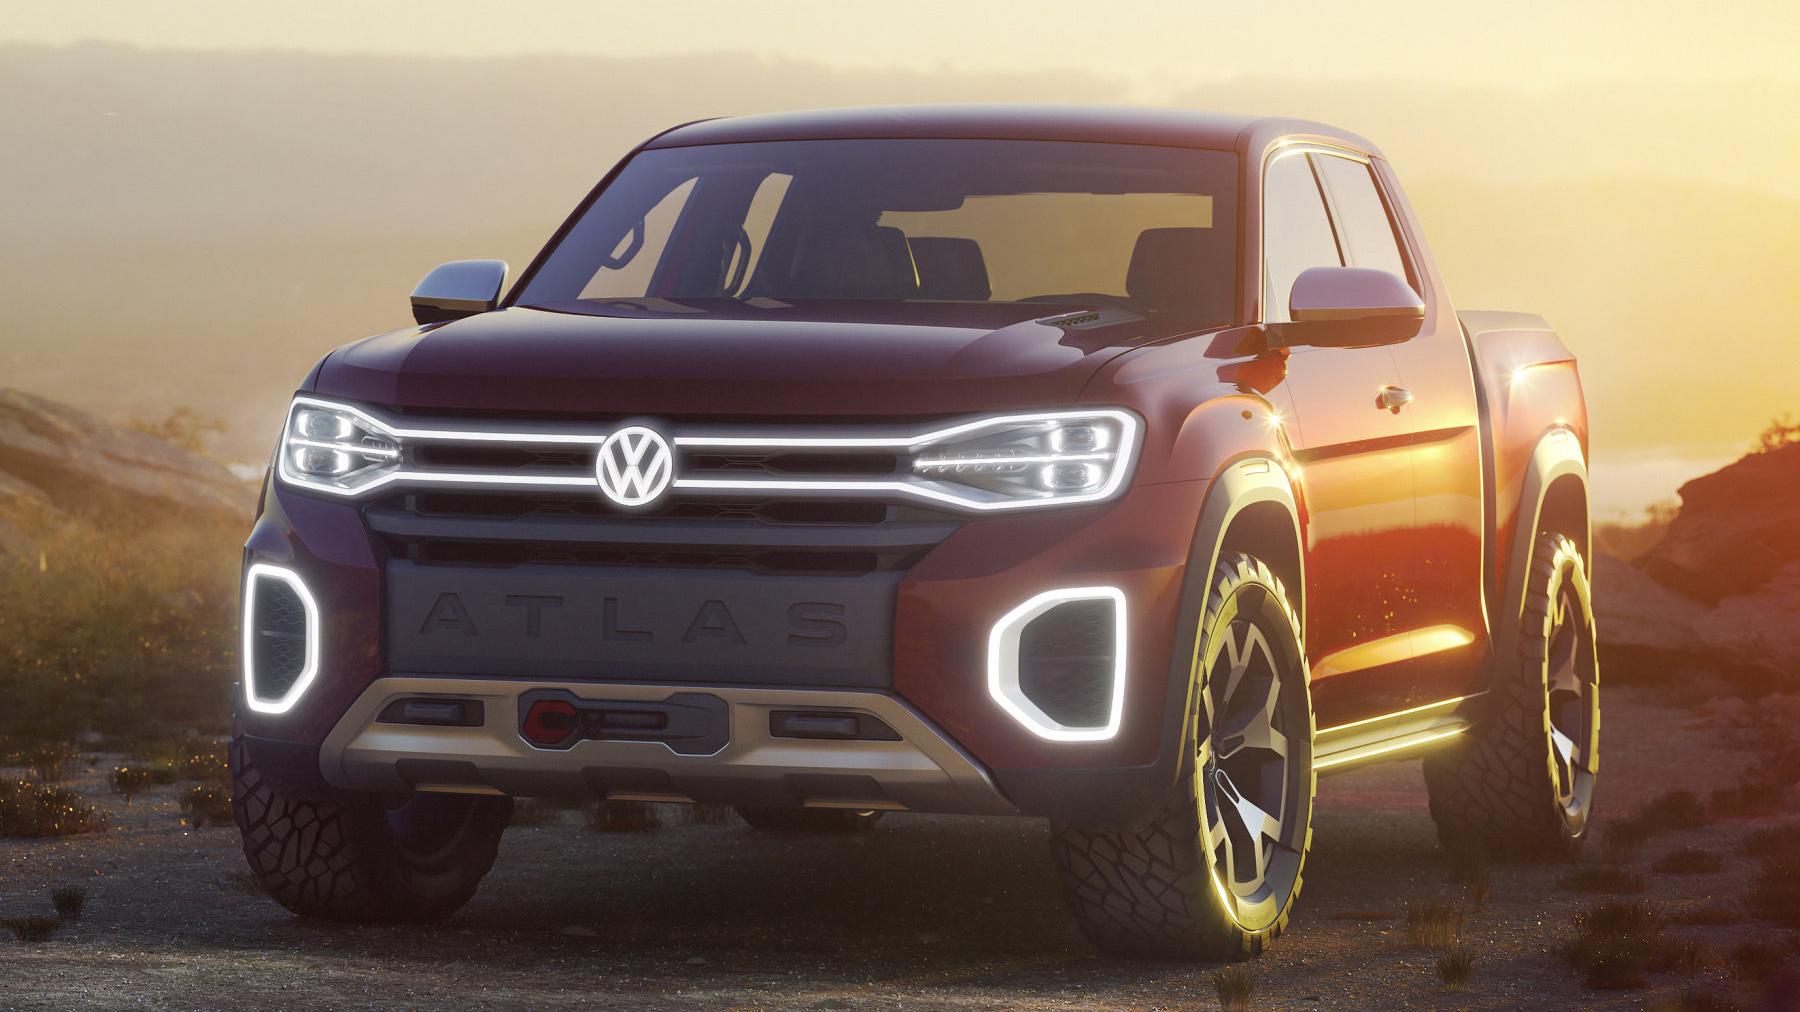 VW Atlas Tanoak Pick-up USA Volkswagen Dieselgate